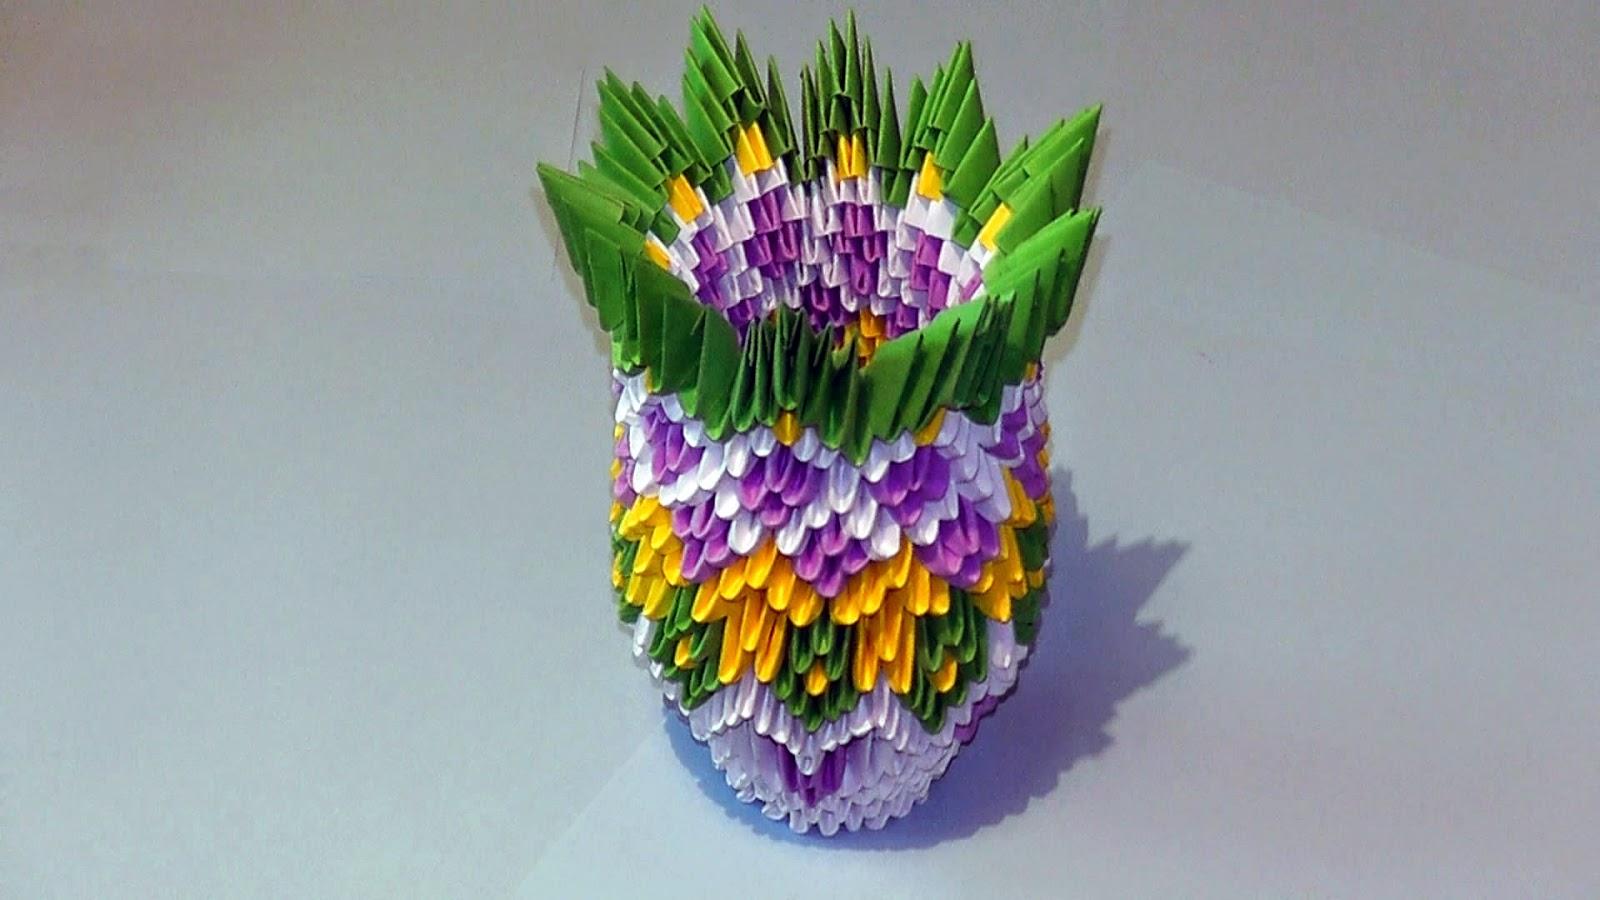 Simple origami vase gallery vases design picture 3d origami vase easy simple origami for kids 3d origami vase easy reviewsmspy floridaeventfo Images